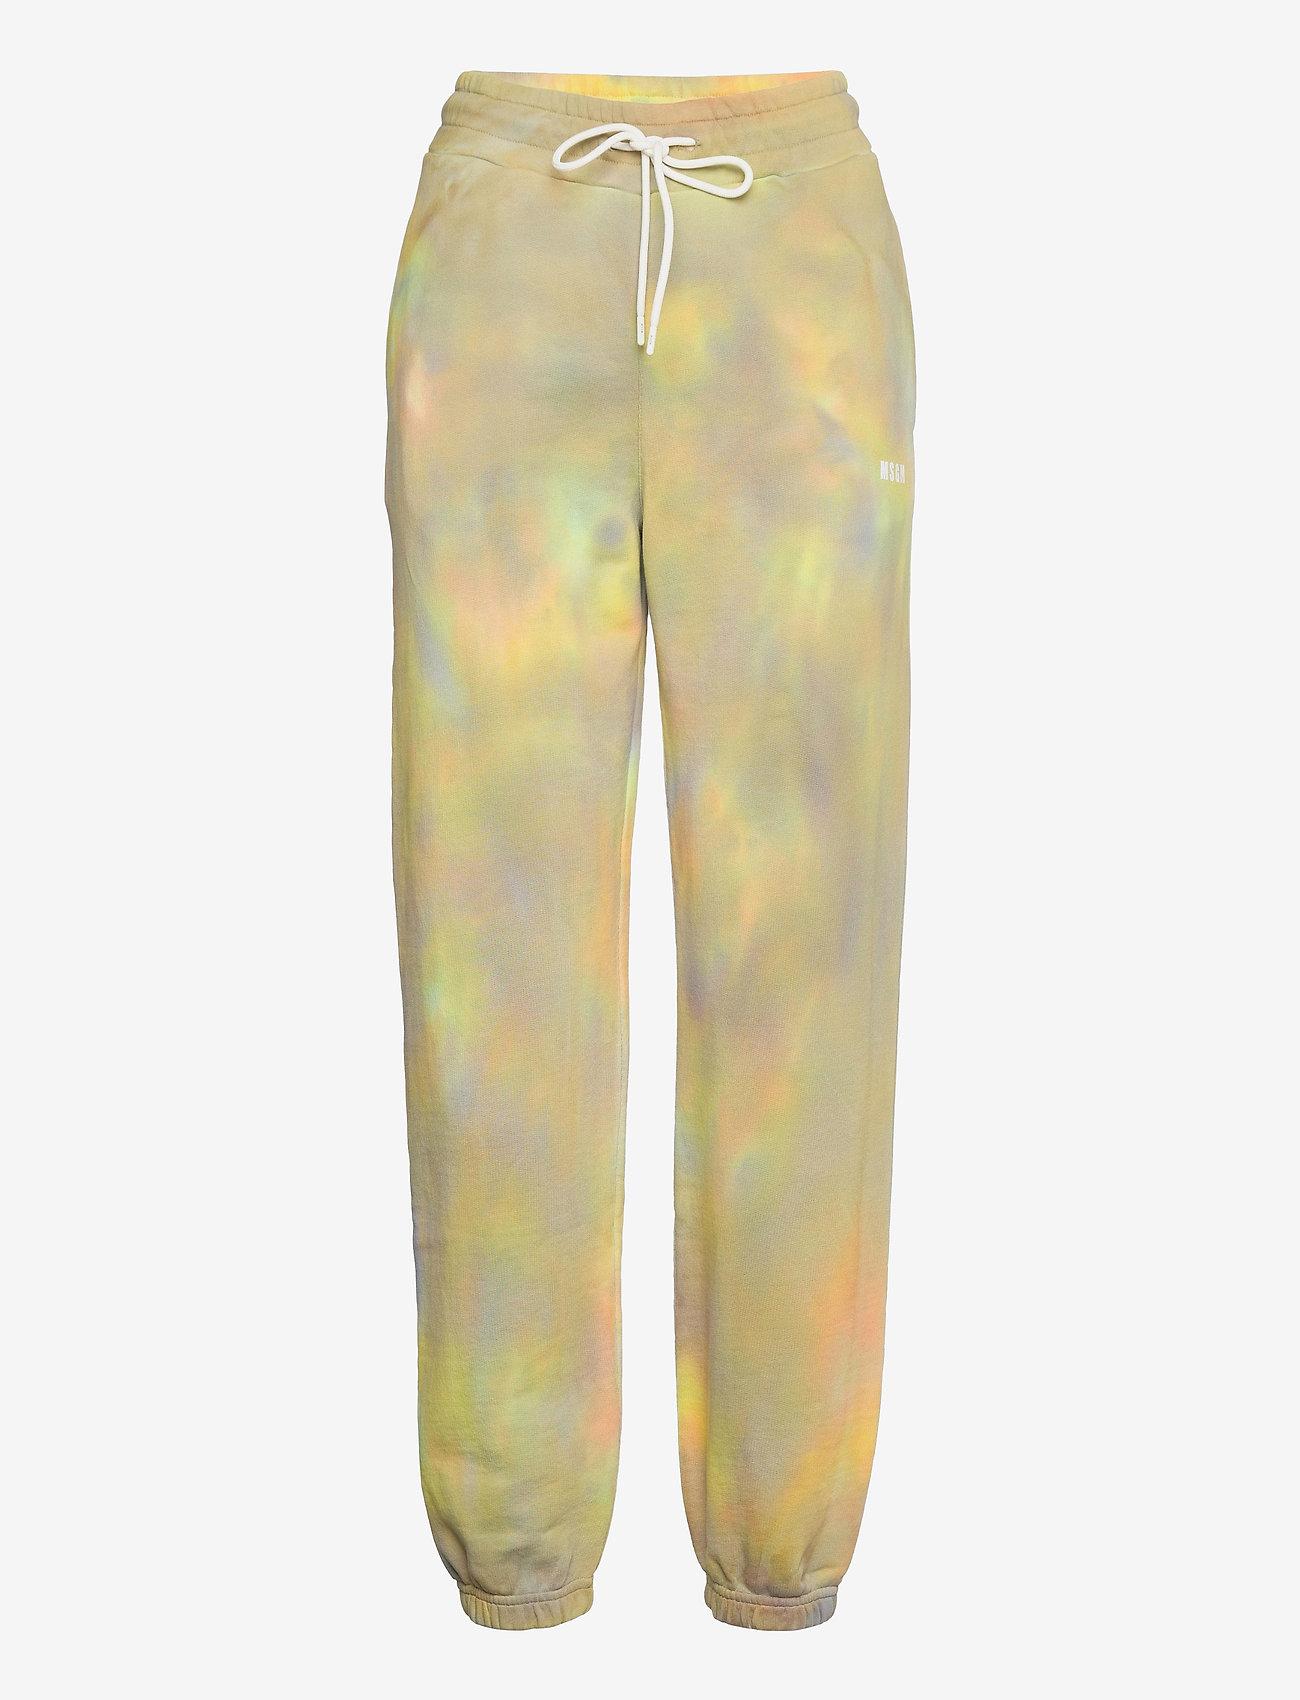 MSGM - PANTALONE/PANTS - sale - multi coloured - 0